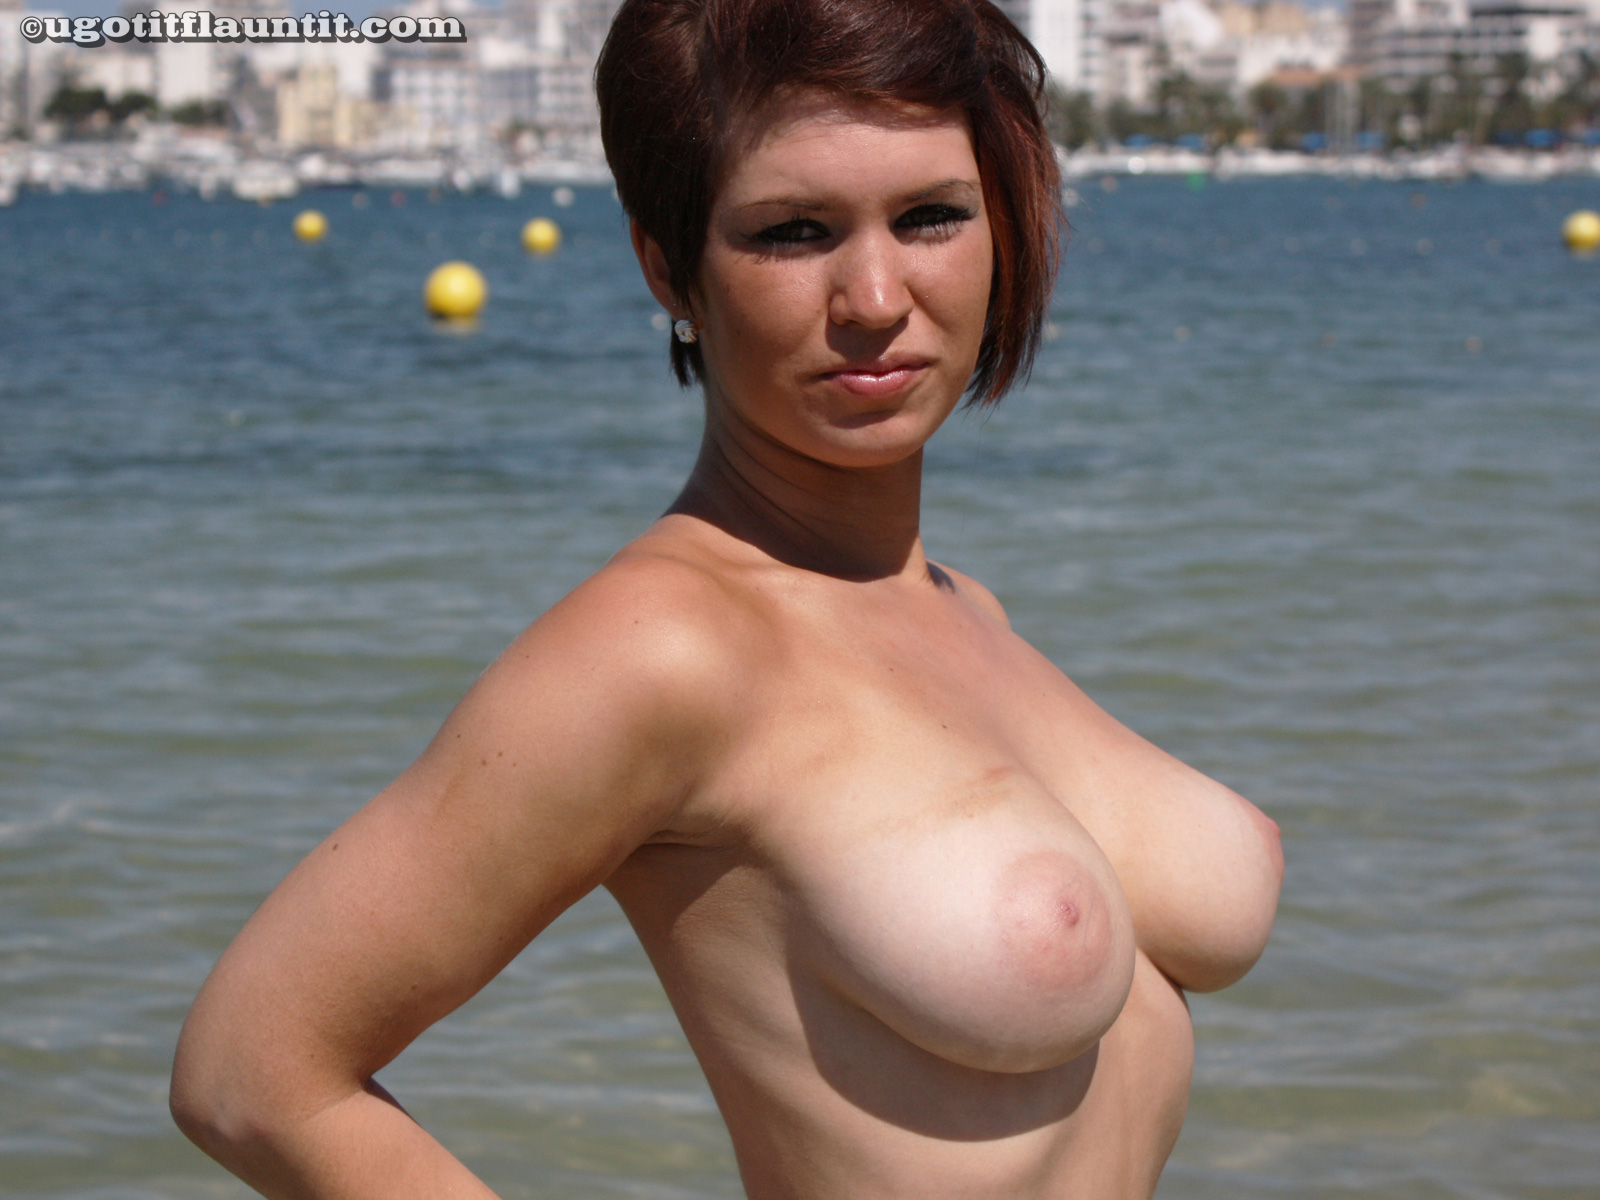 Nude Girls From Full Throttle